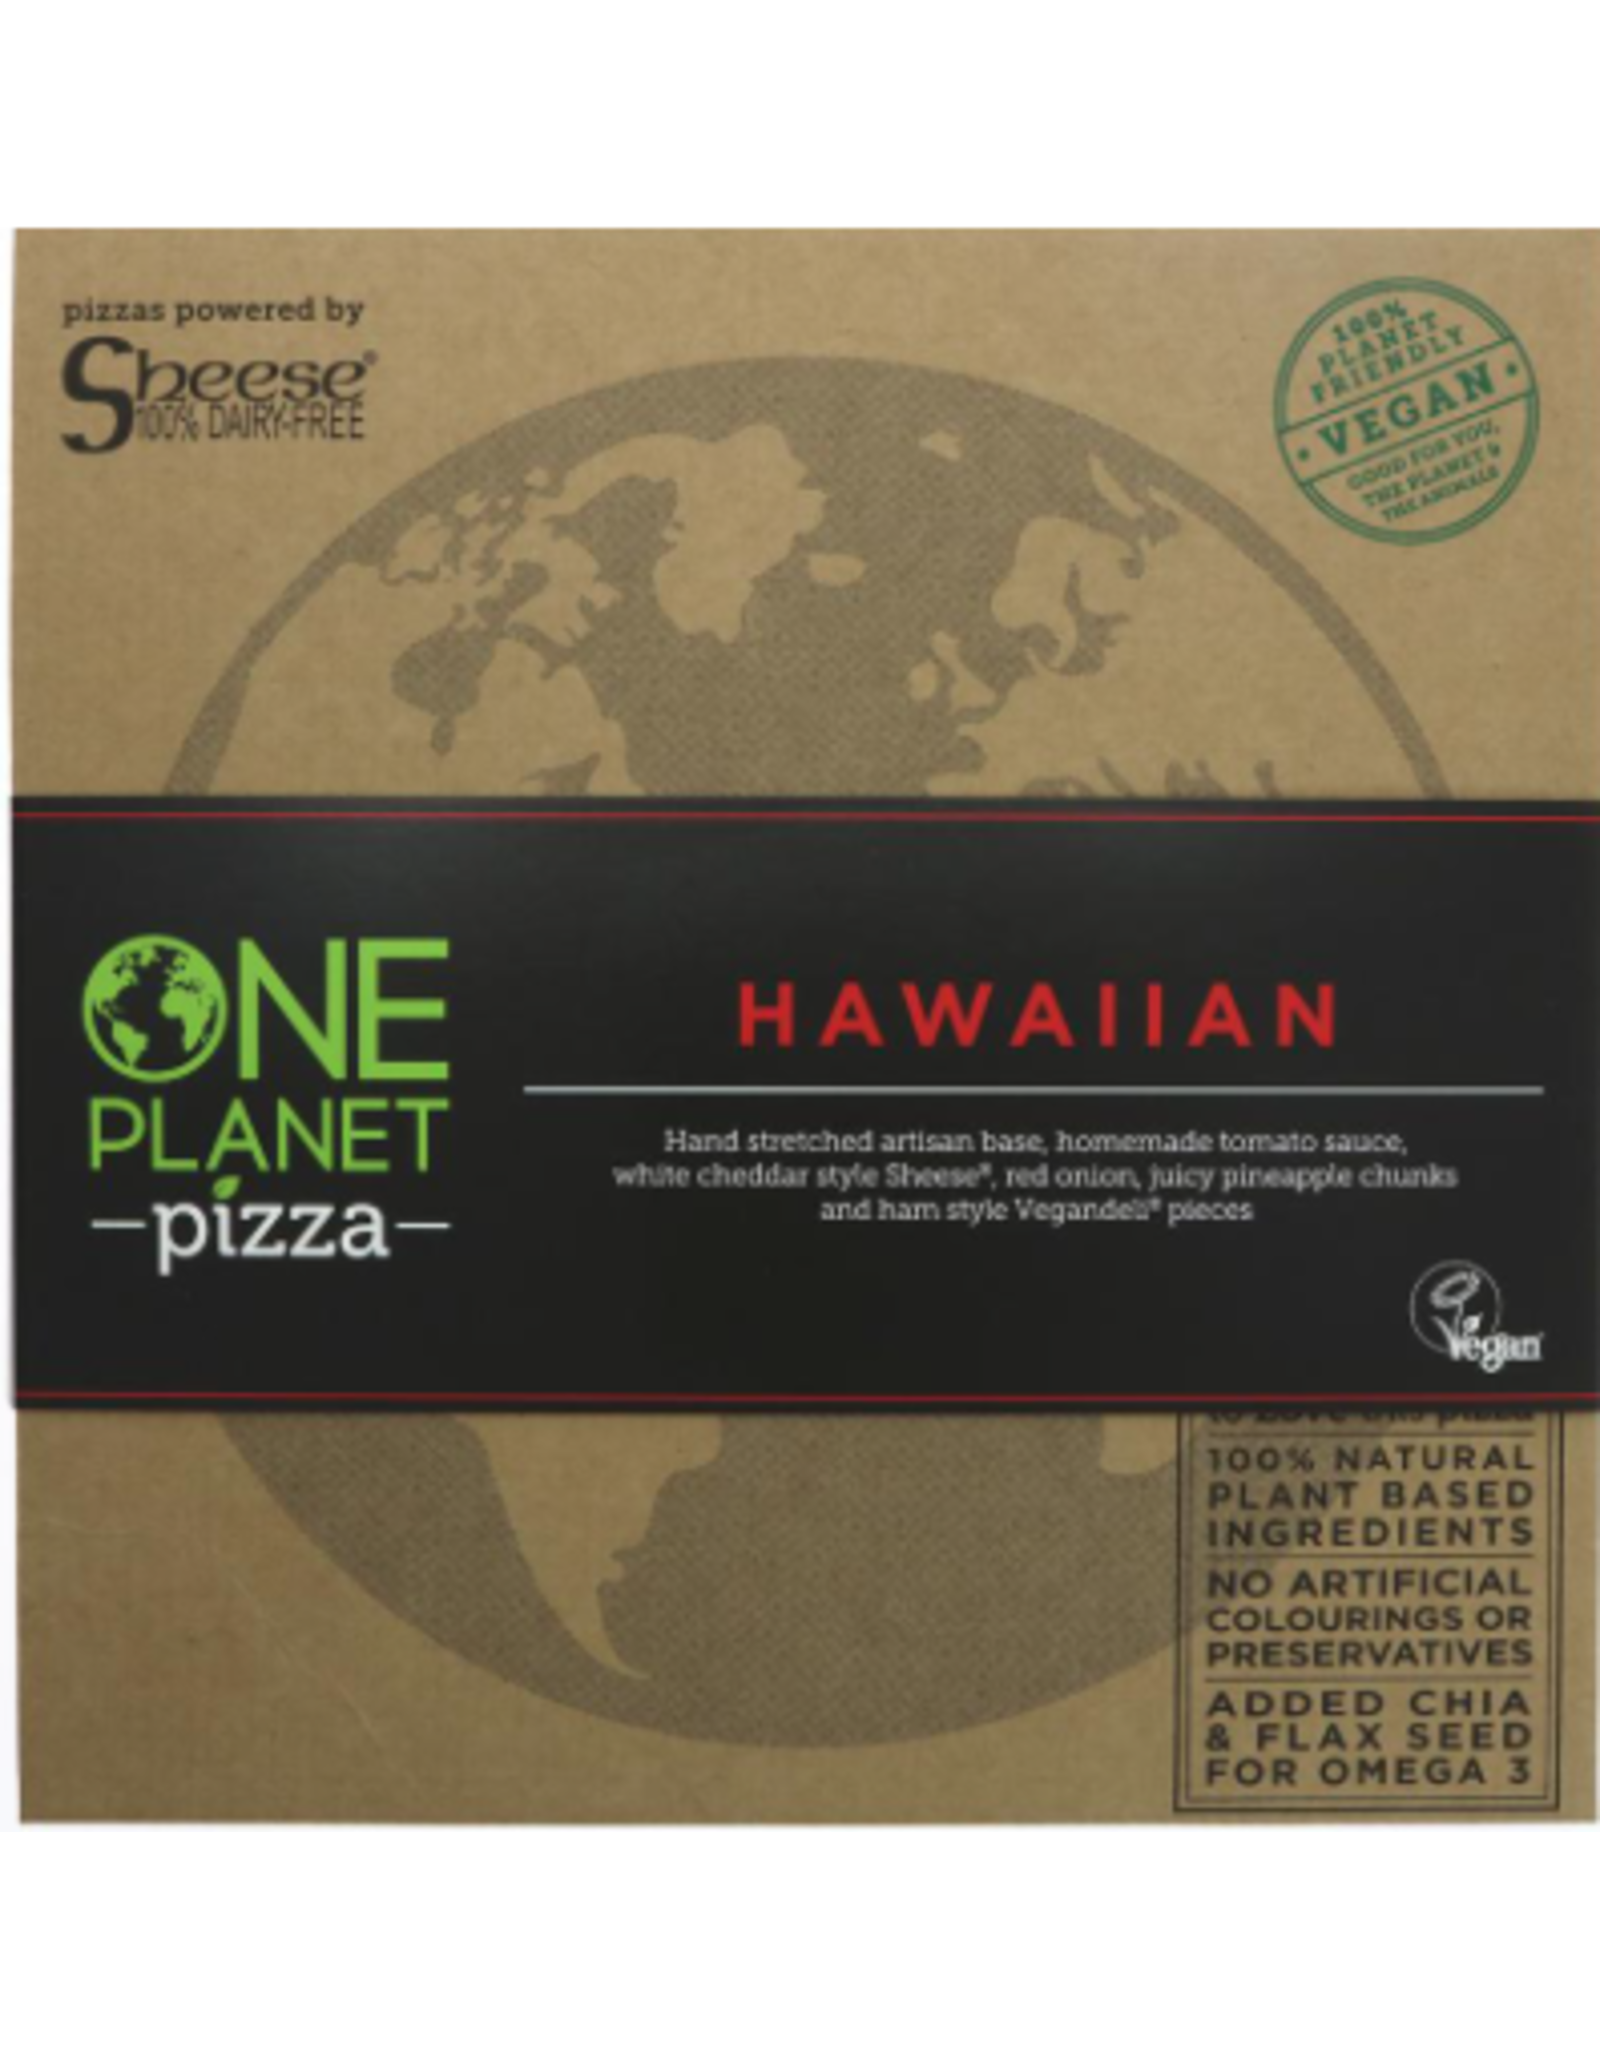 One Planet Pizza Pizza Haiwana, 455g  ❄️❄️❄️